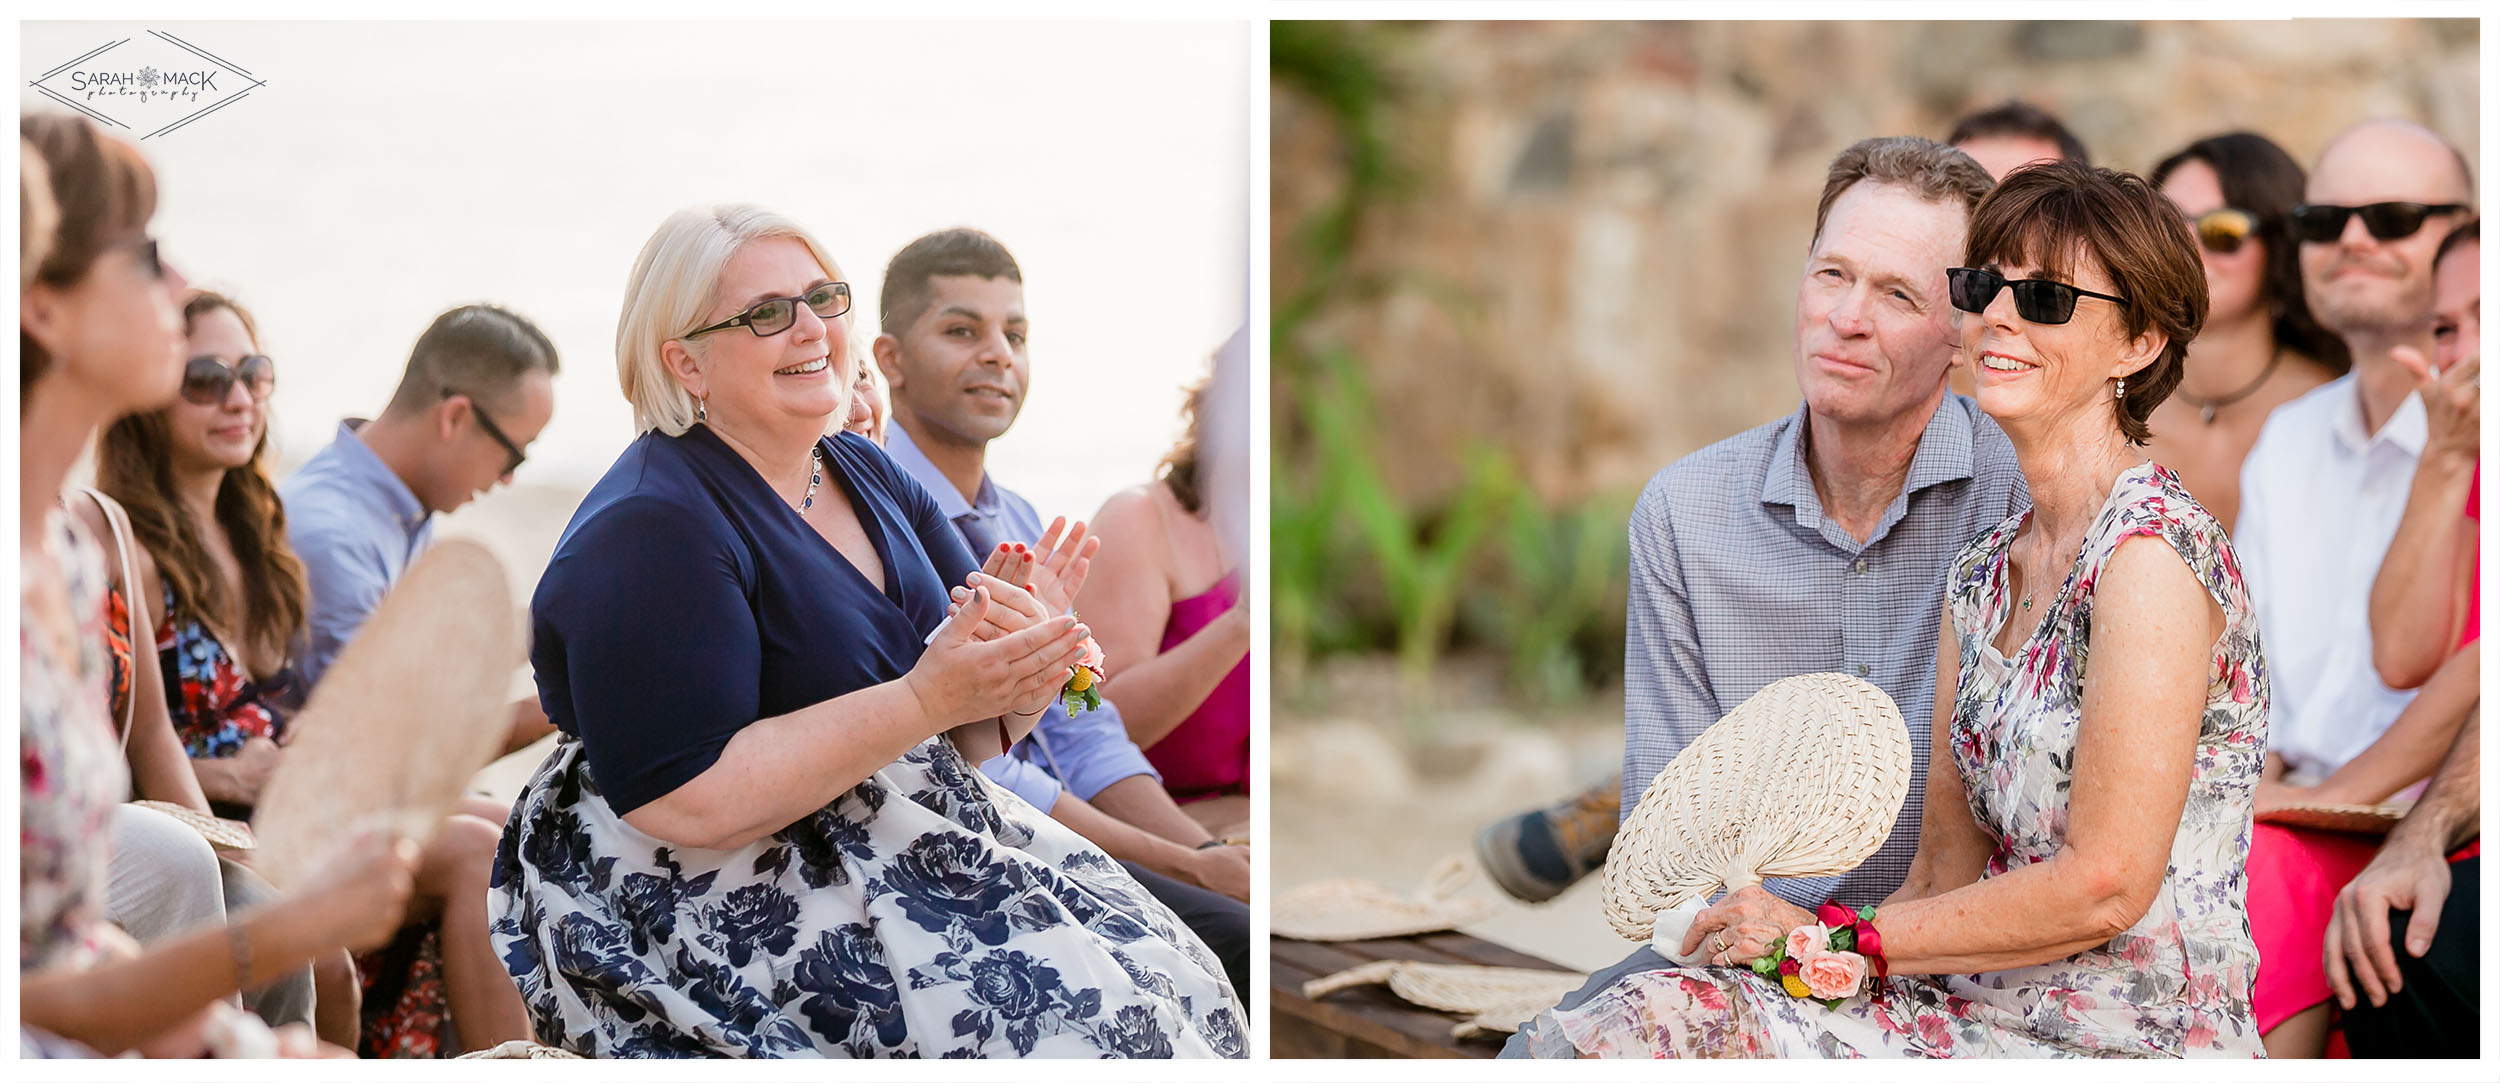 ES-Flor-de-Playa-Sayulita-Wedding-Photography-40.jpg